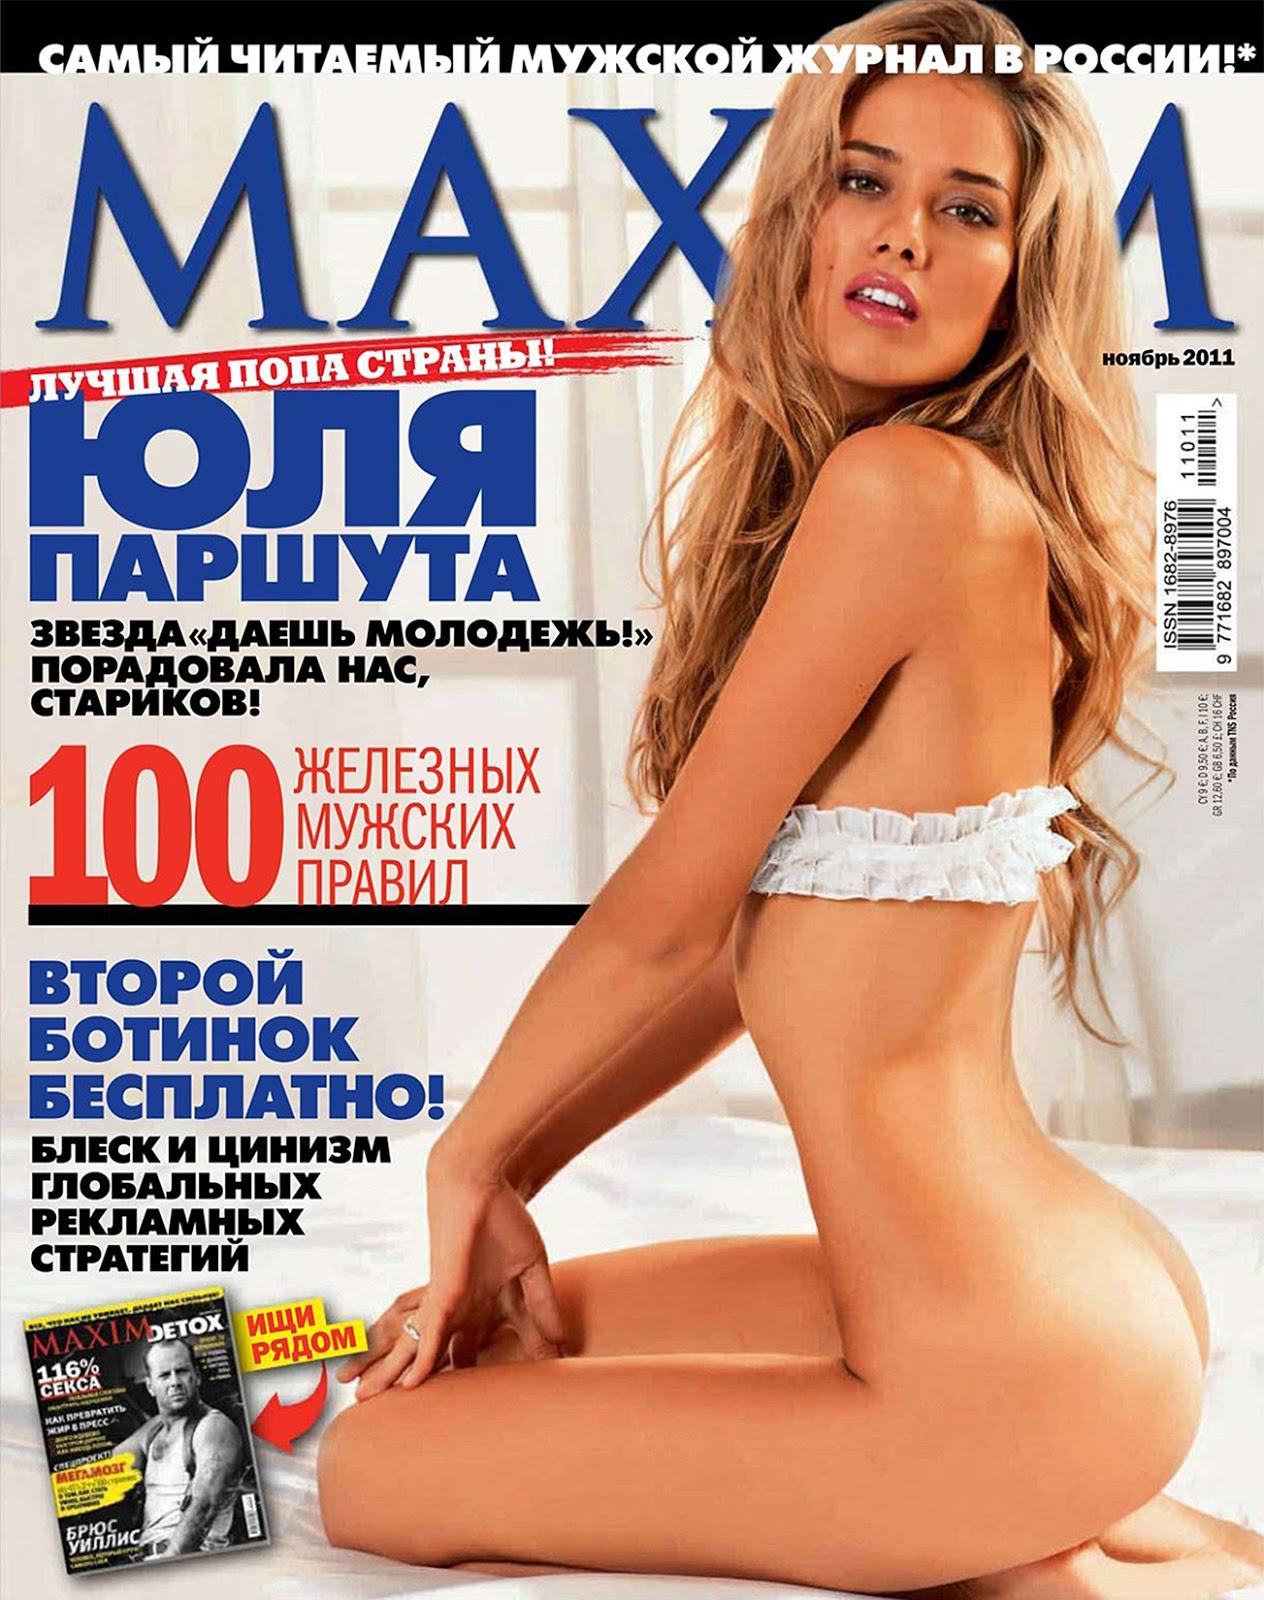 foto-sluchai-s-seksualnoy-timoshenko